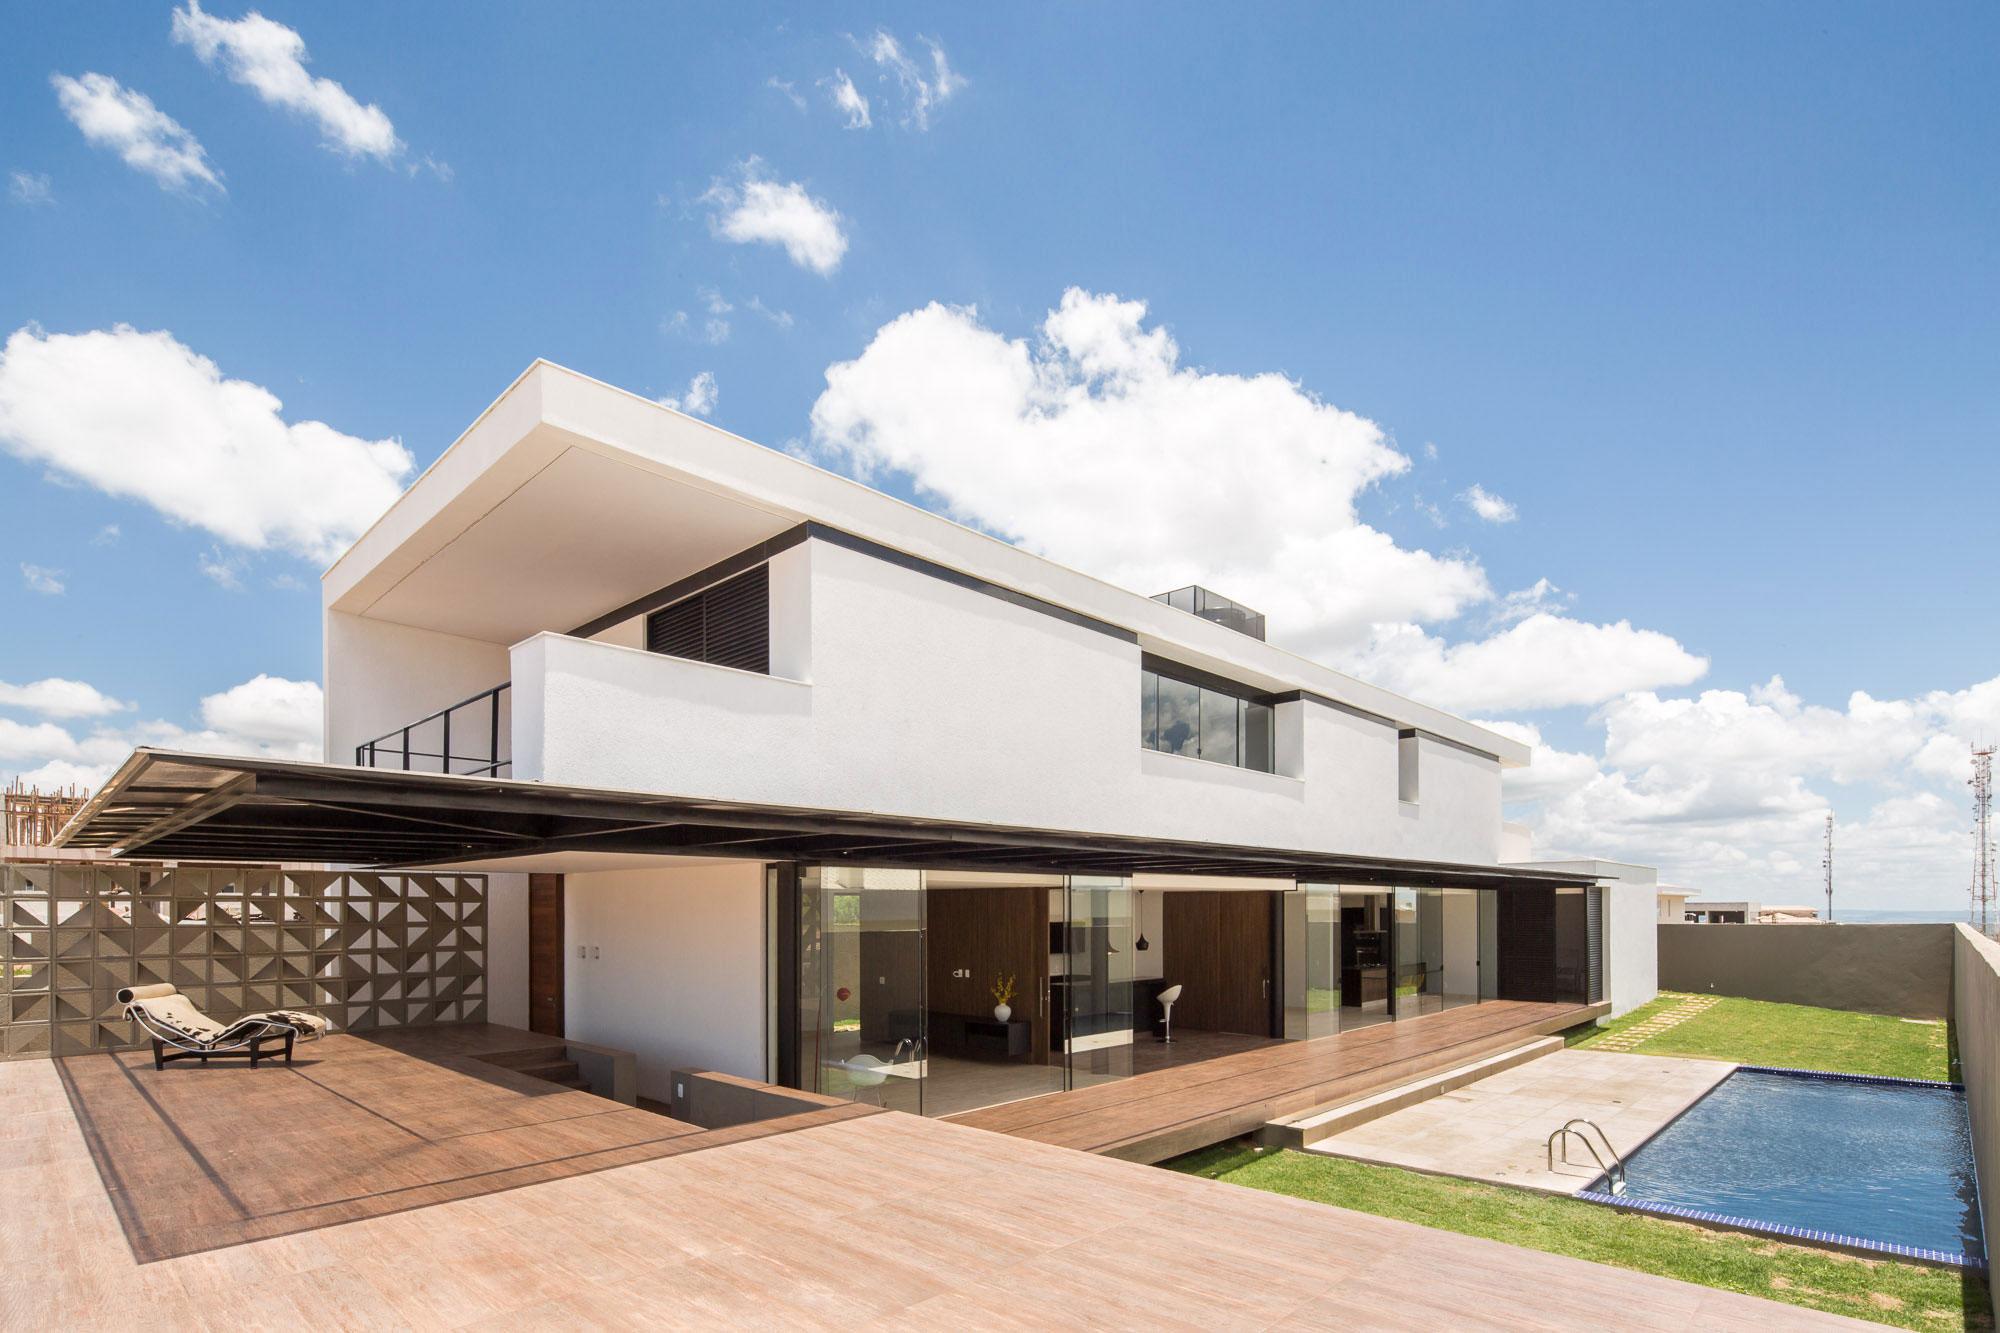 Casa MCO by Esquadra|Yi-03